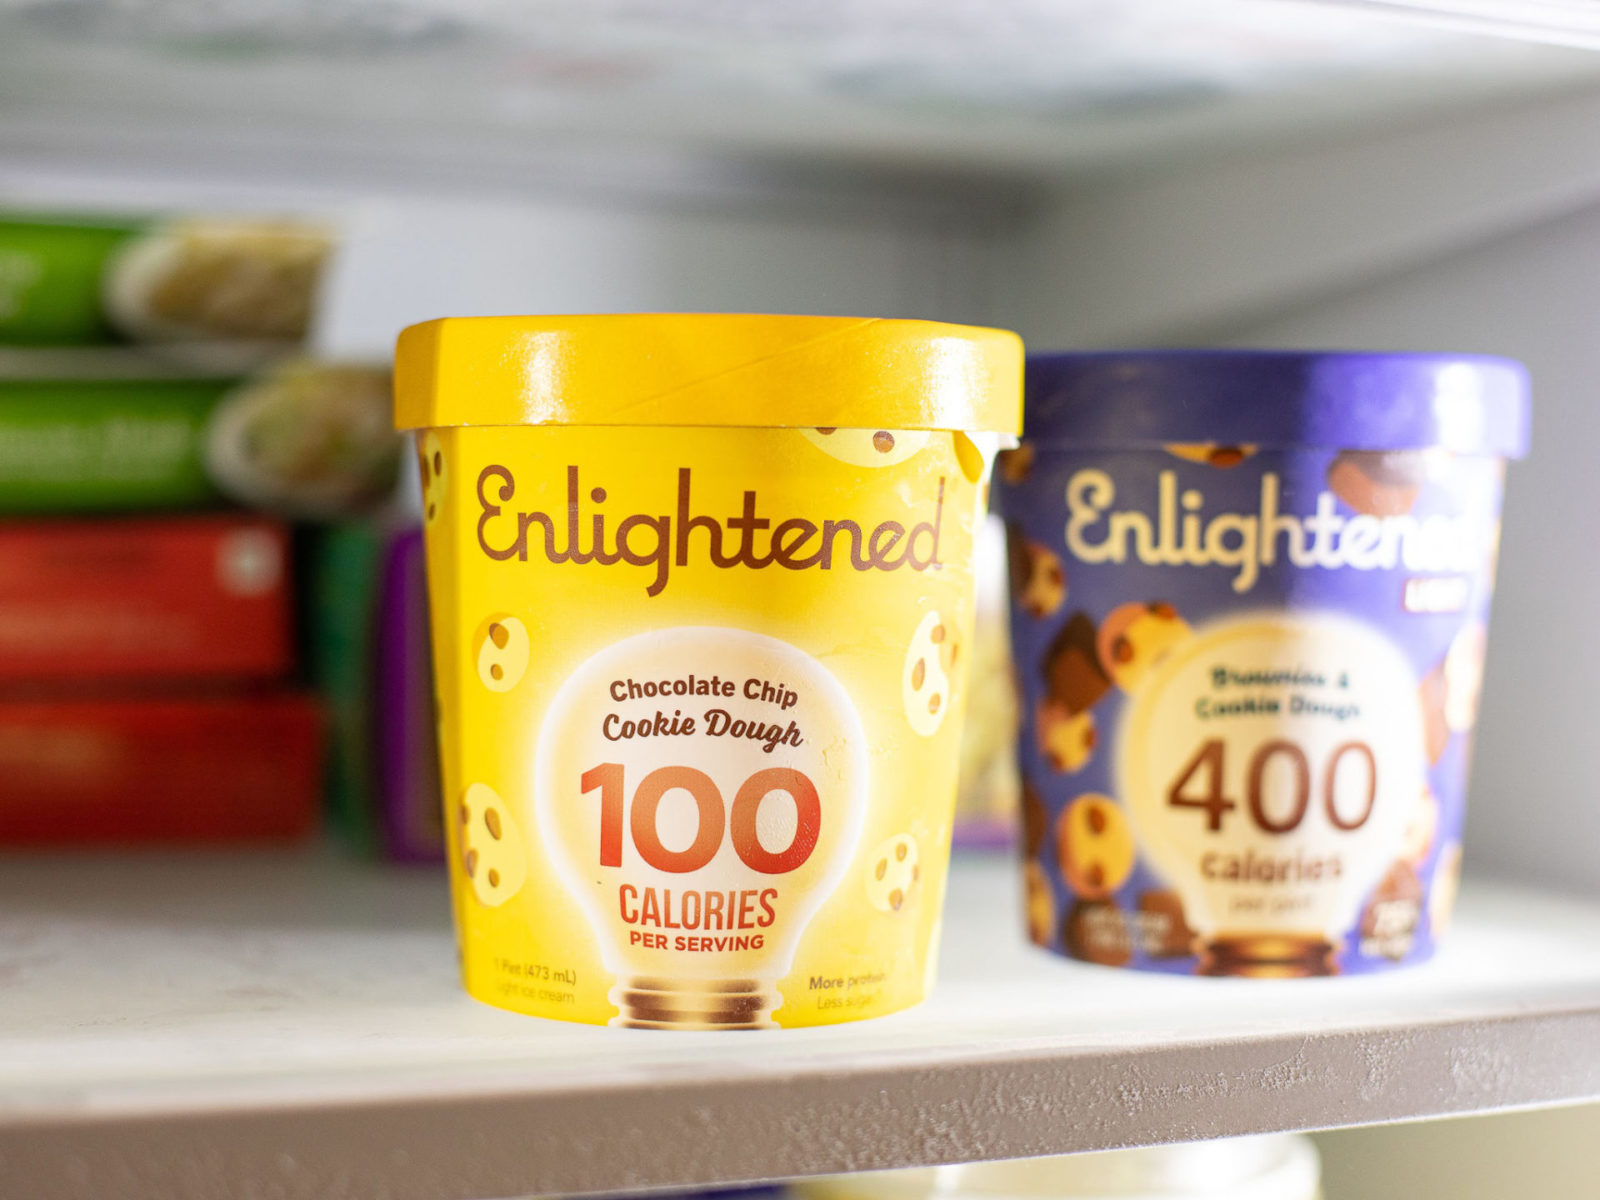 Enlightened Light Ice Cream - Just $ 1